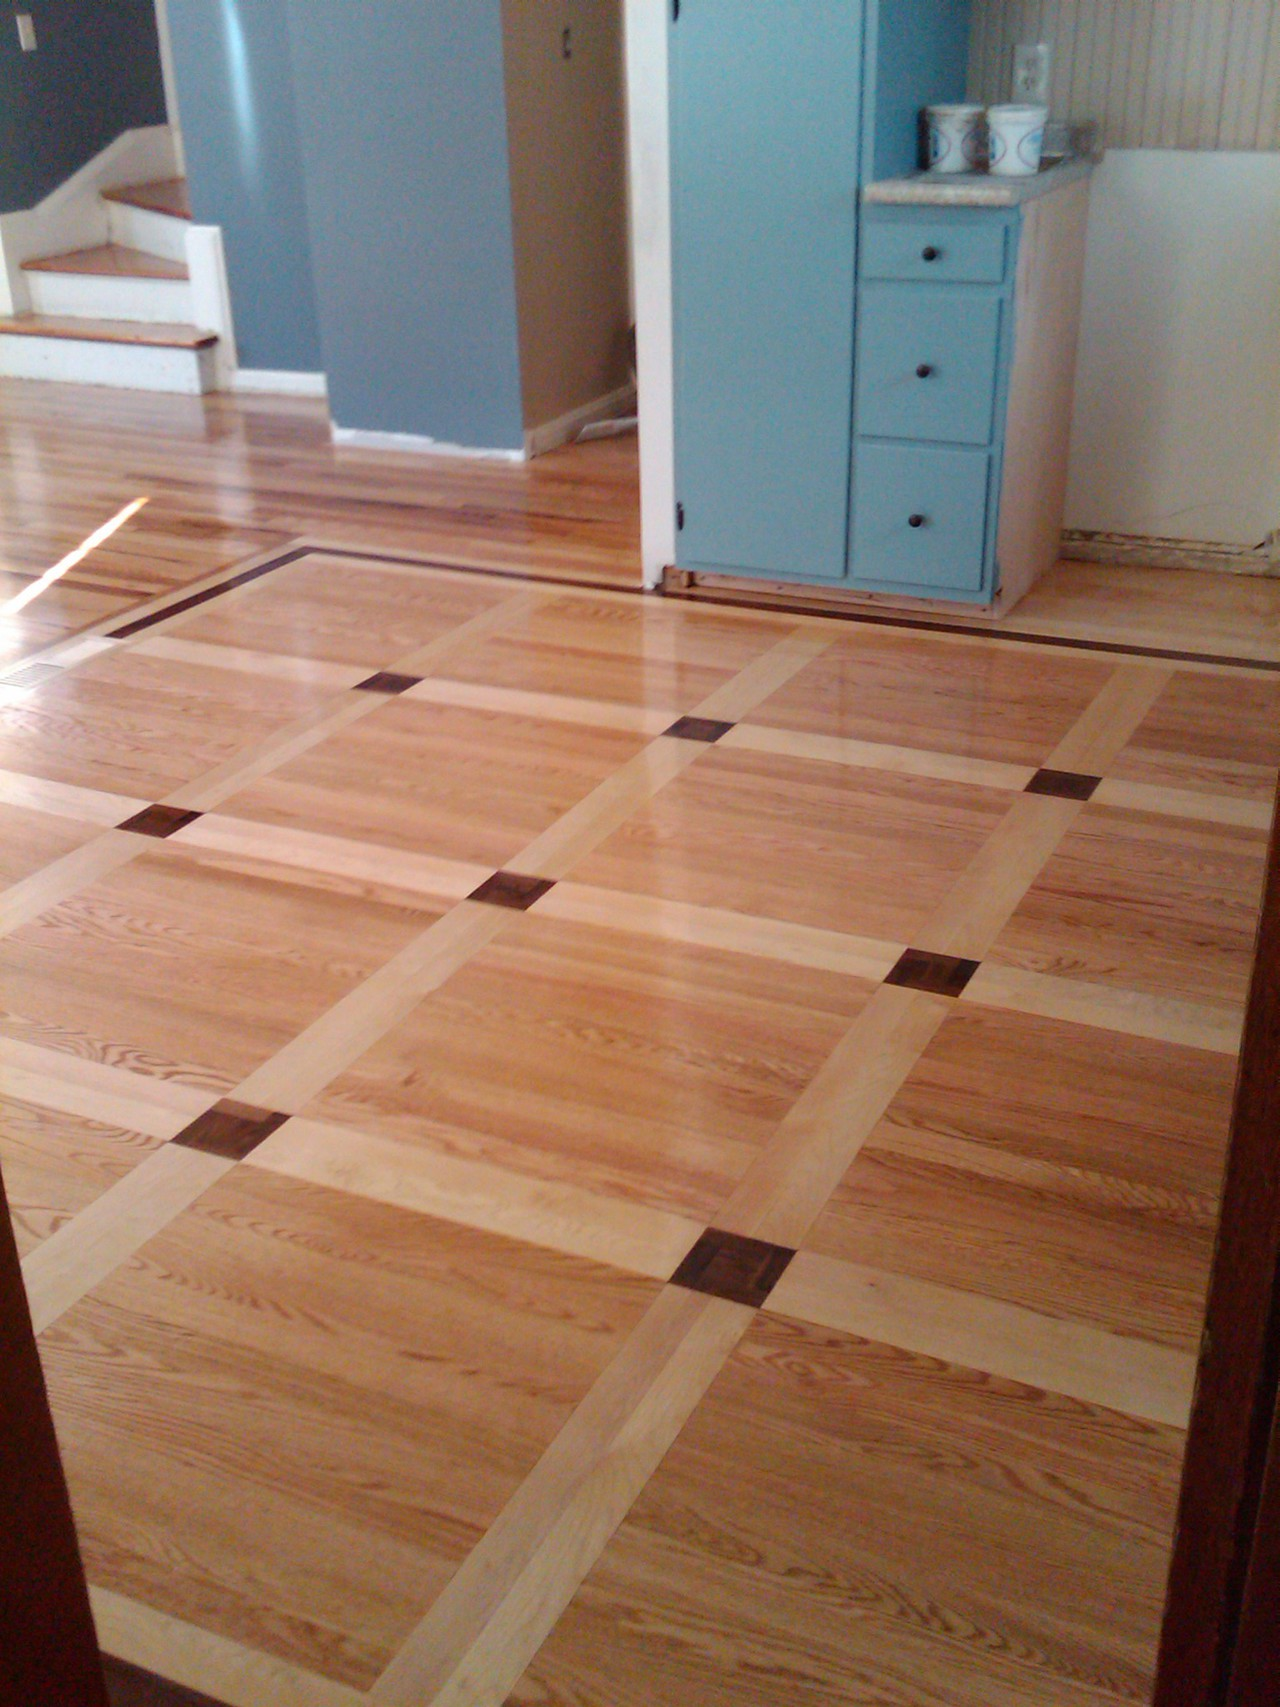 Jt s floor refinishing offers hardwood flooring services for Hardwood flooring service